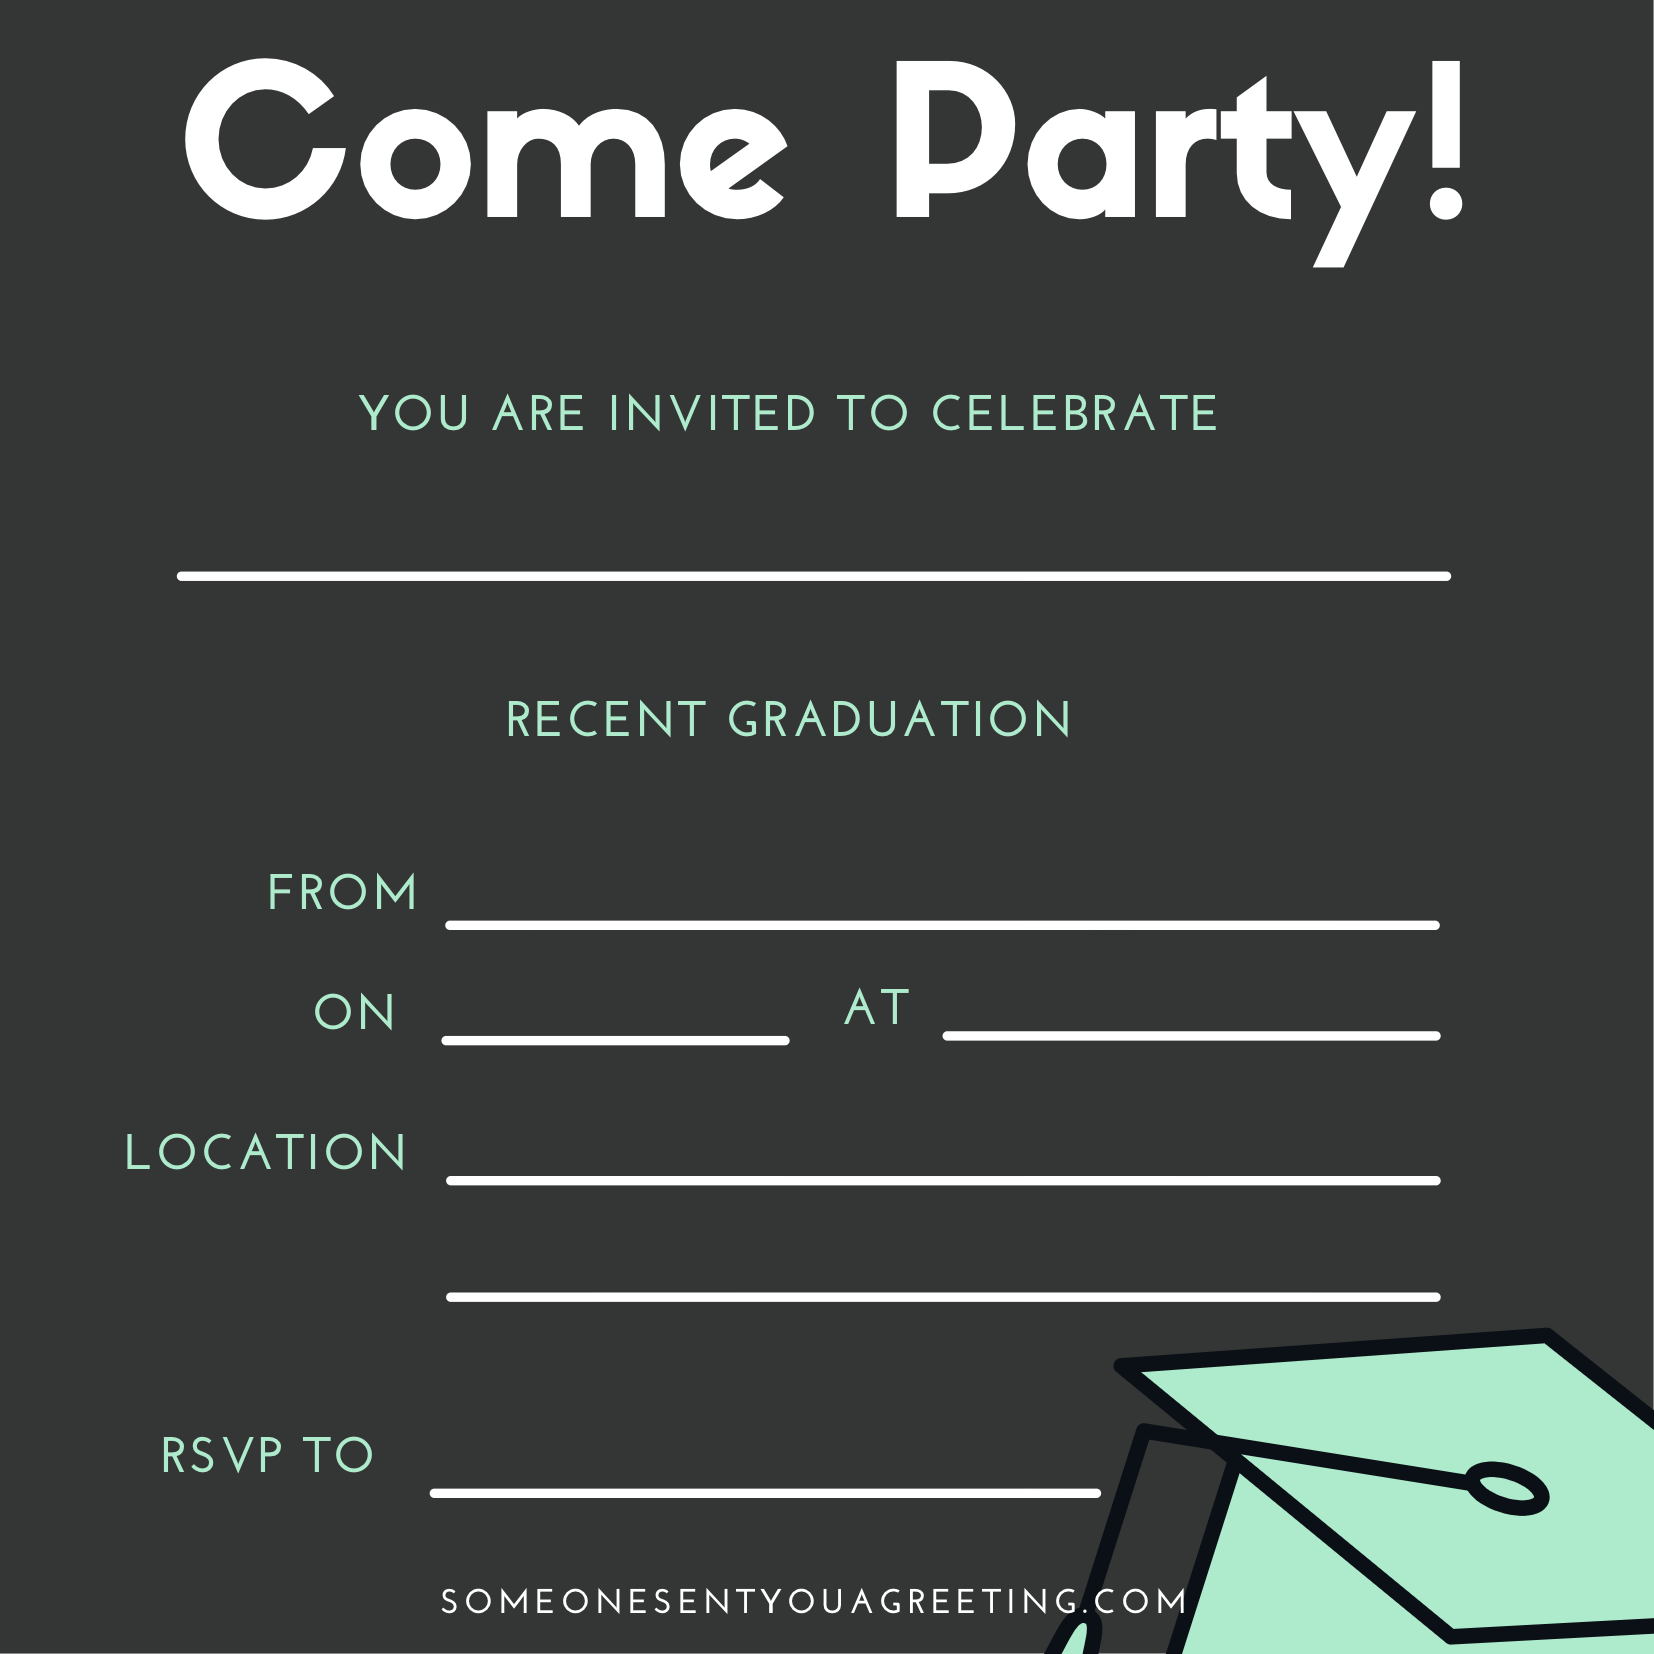 21 Free Printable Graduation Party Invitations - Someone Sent You Throughout Graduation Party Invitation Templates Free Word